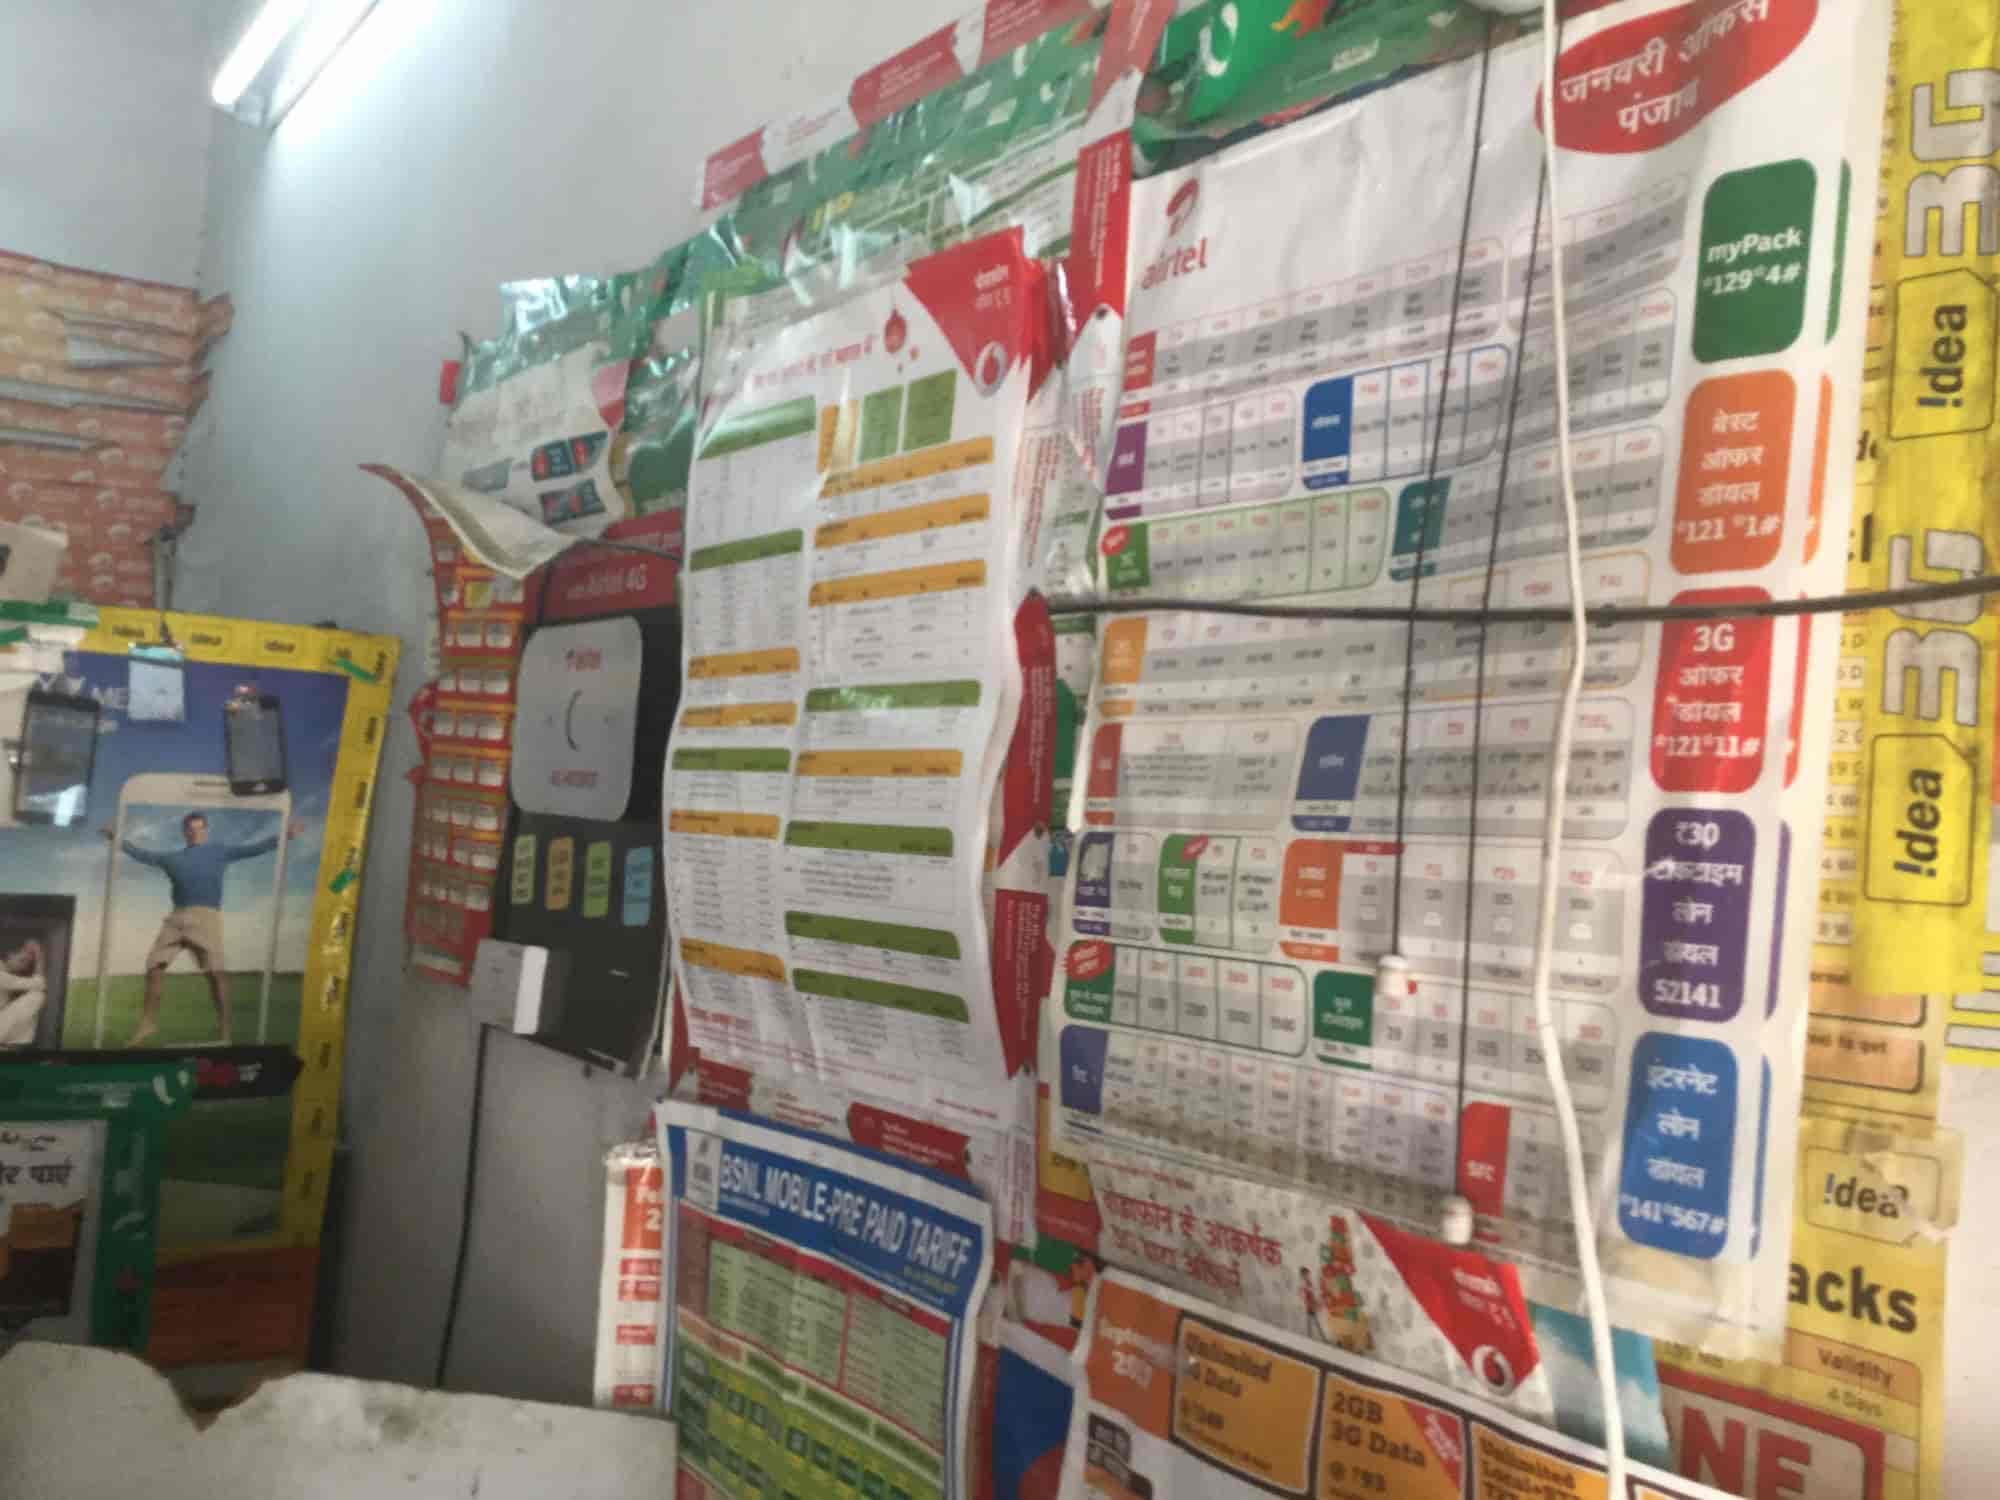 Mago Möbel mago mobile repair photos jalandhar city jalandhar pictures